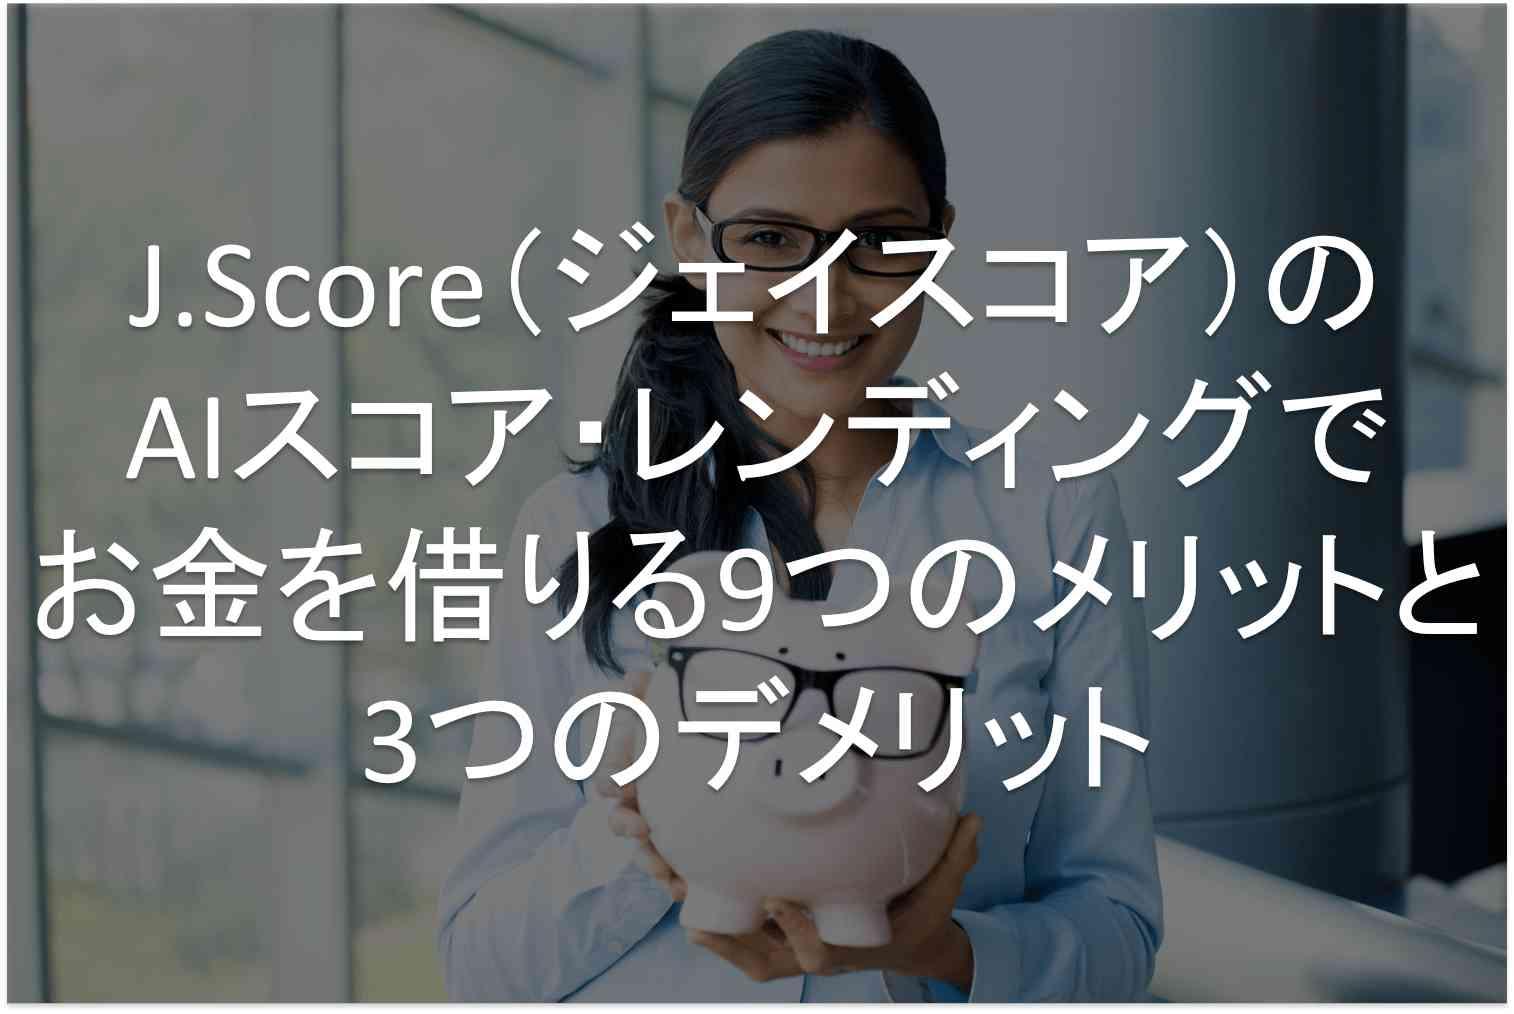 J.Score メリット デメリット